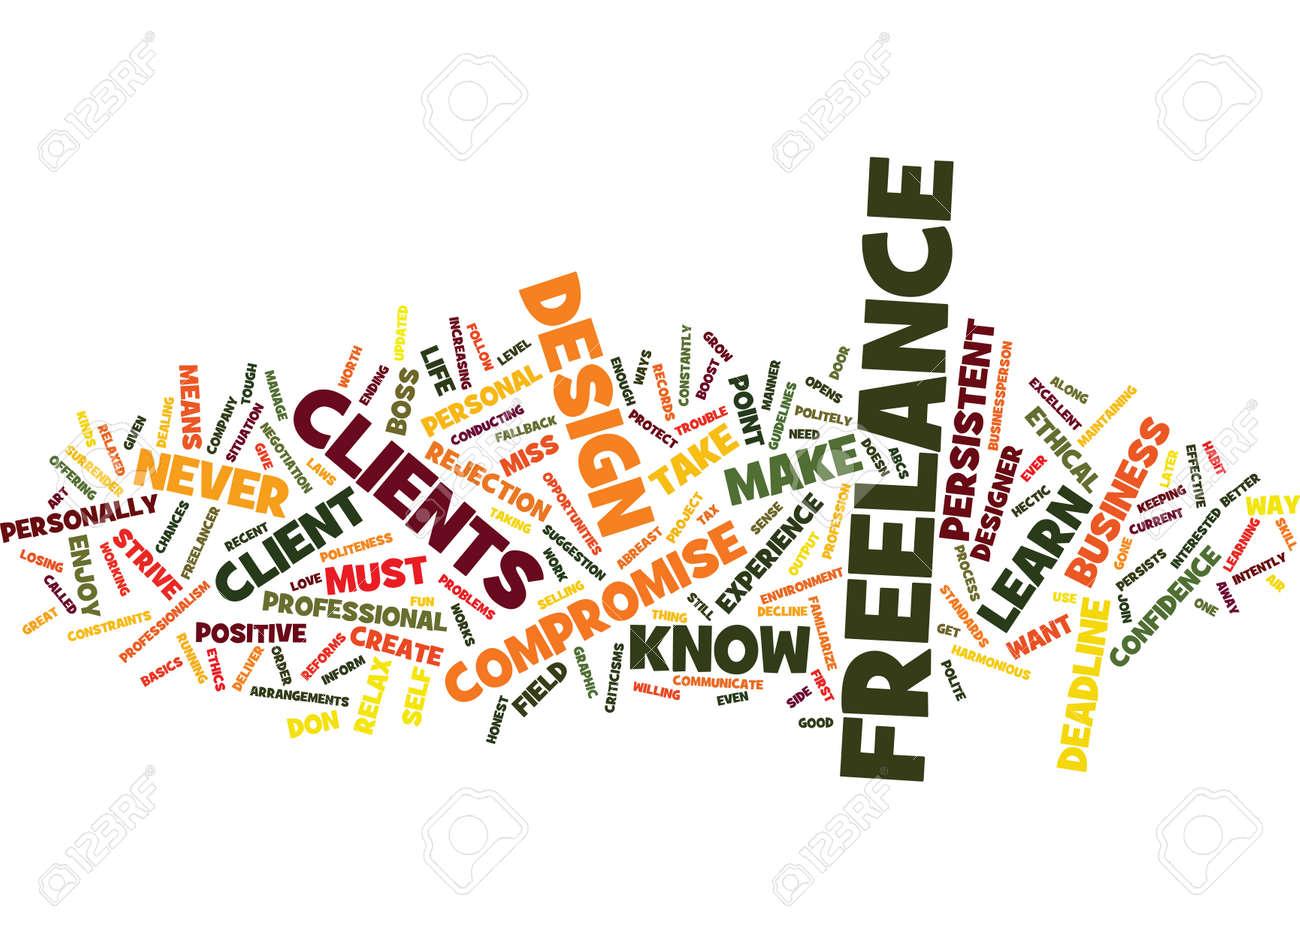 FREELANCE DESIGN Text Background Word Cloud Concept - 82607995